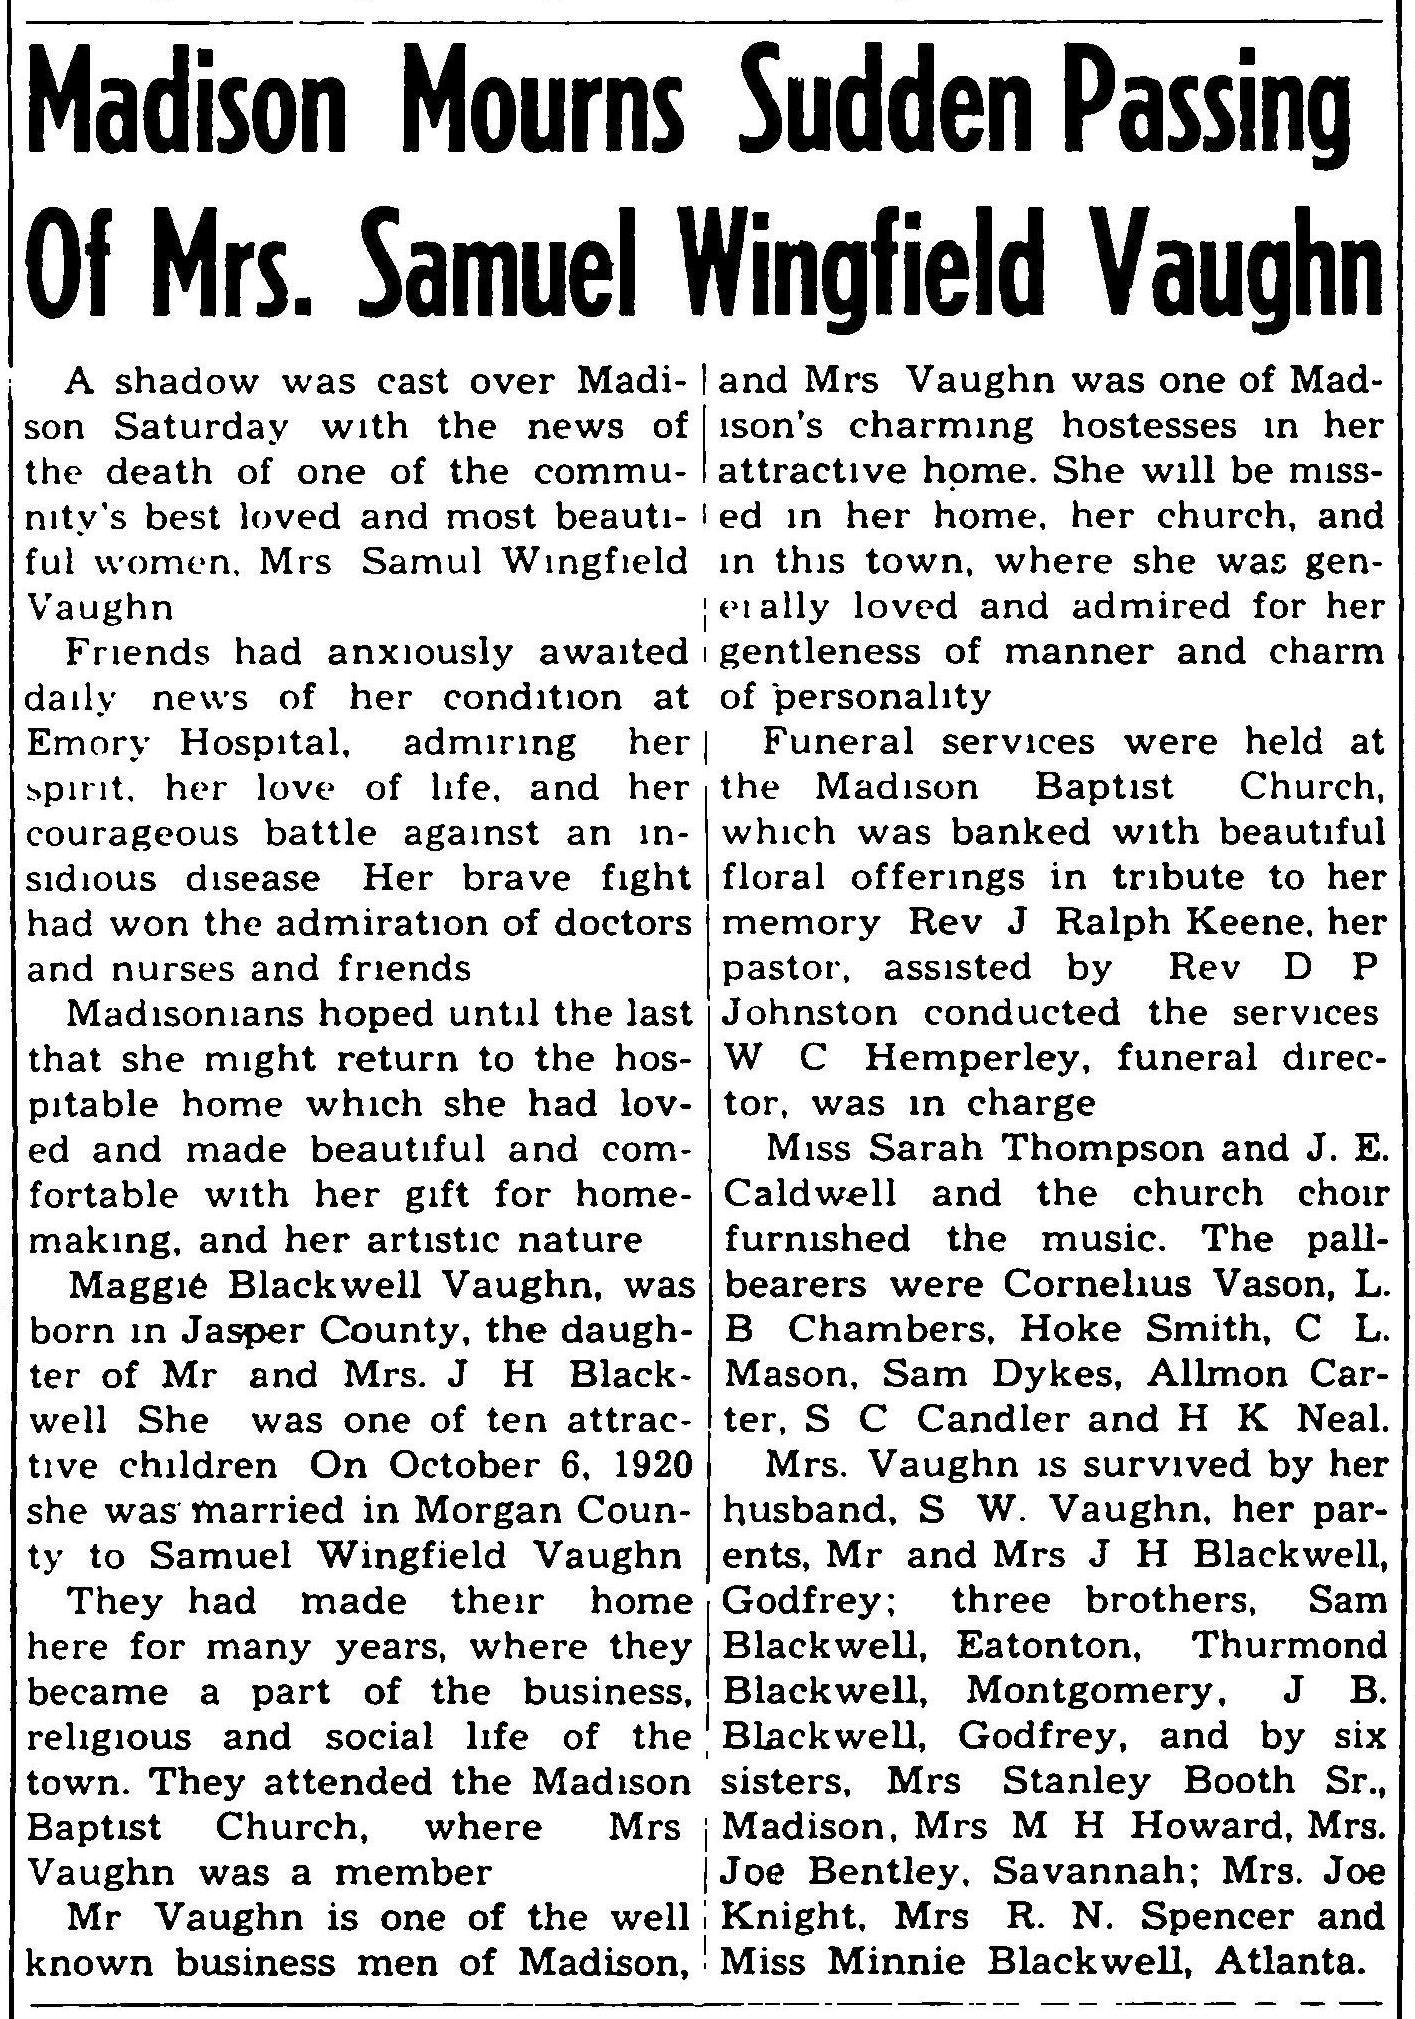 vaughn_maggieblackwell_1948-obituary.jpe